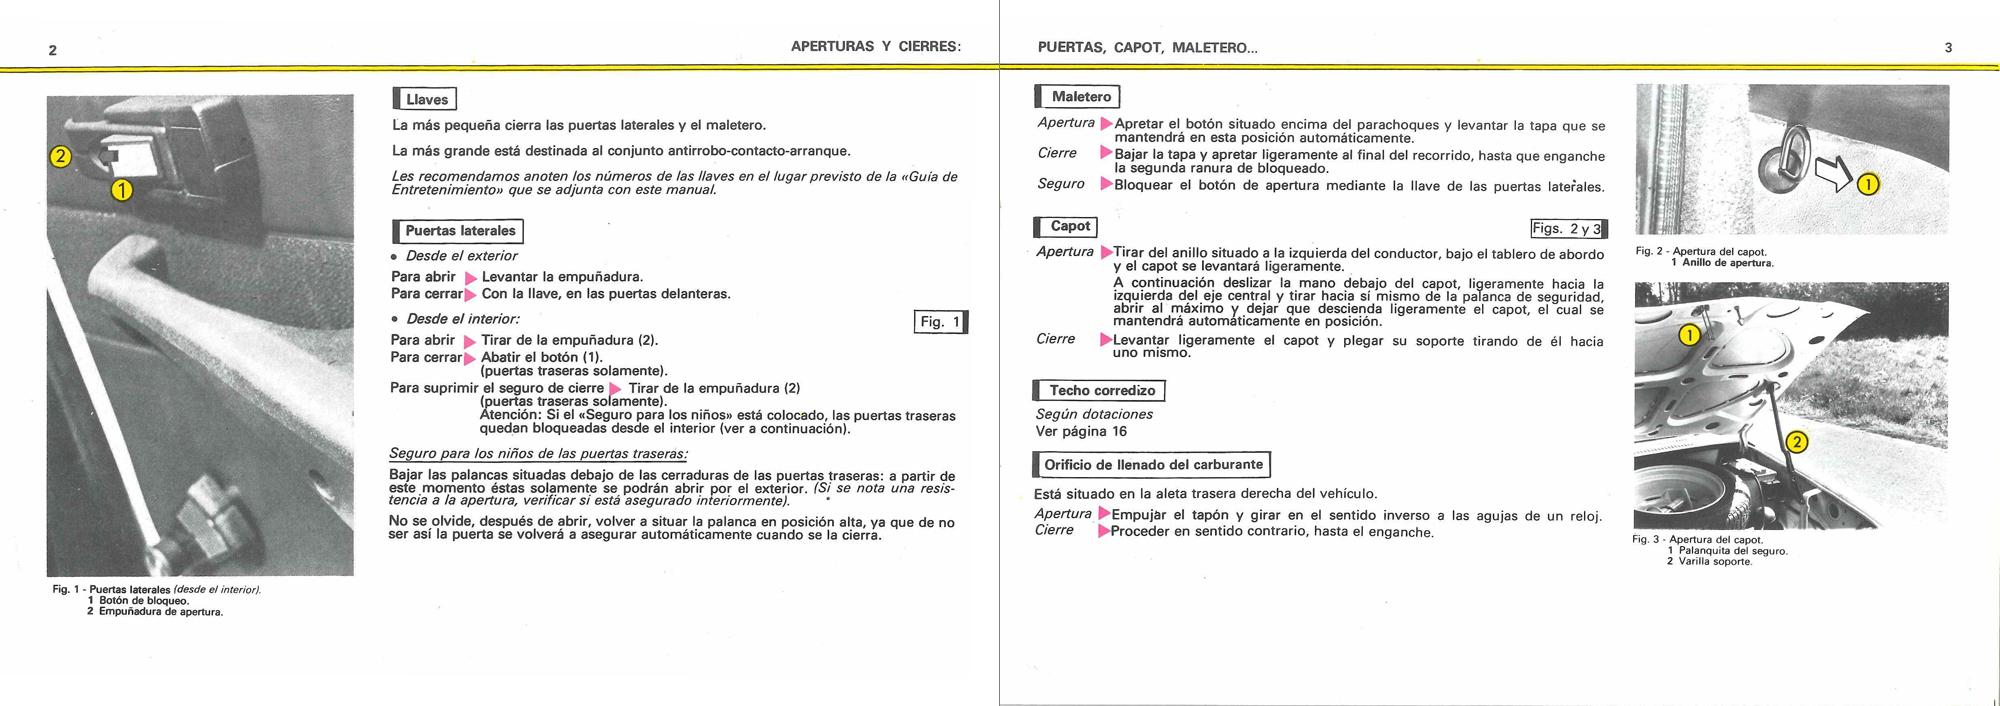 1979 Spanish Citroën GSX2 Manual de empleo (owner's manual) #1